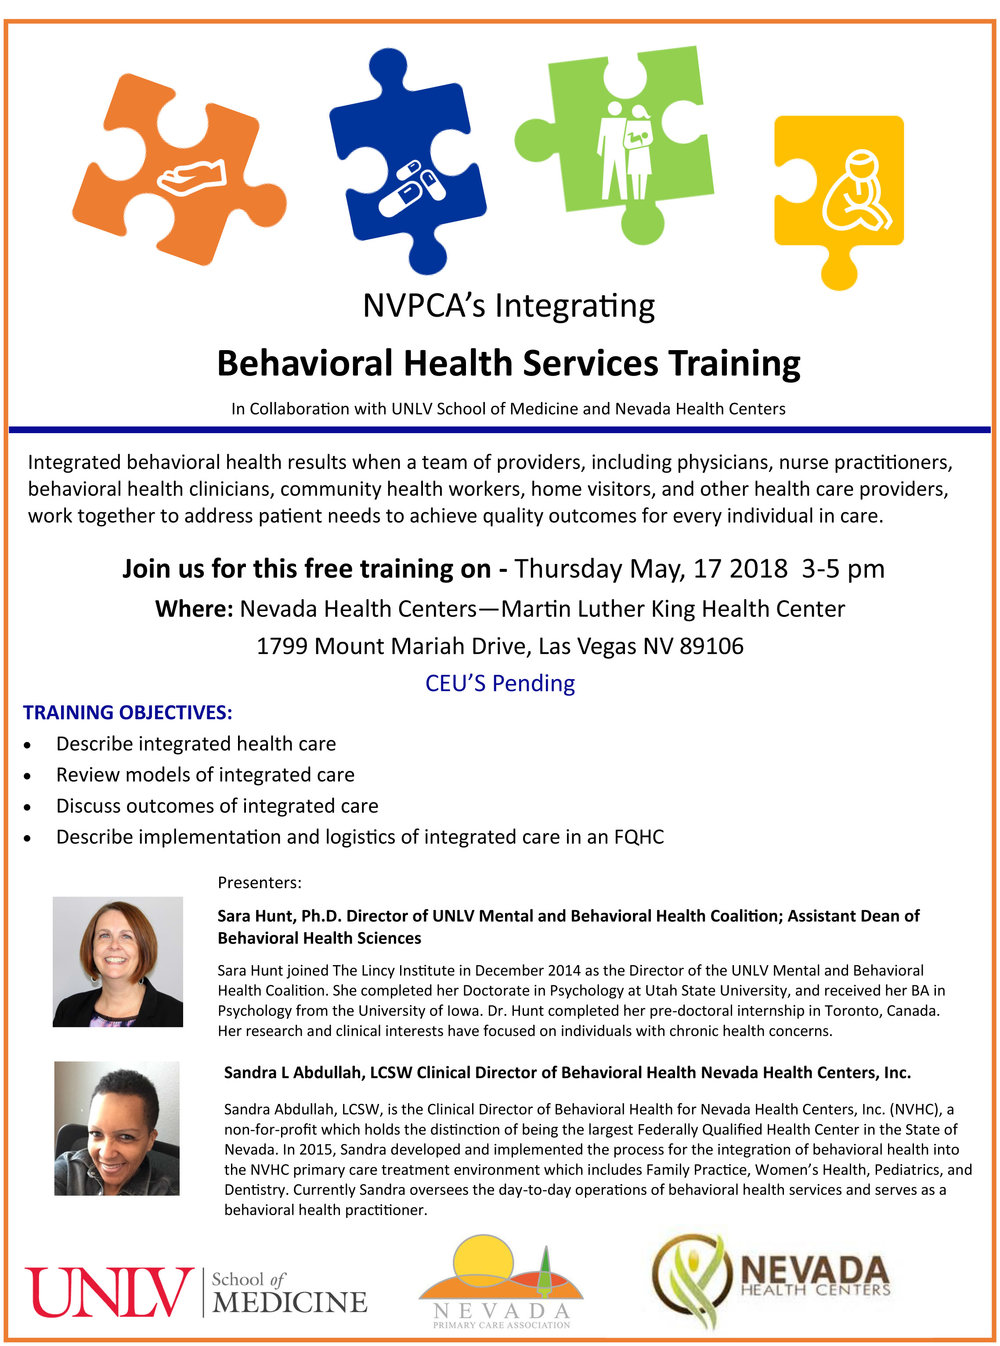 Behavioral Health Training Flyer.jpg